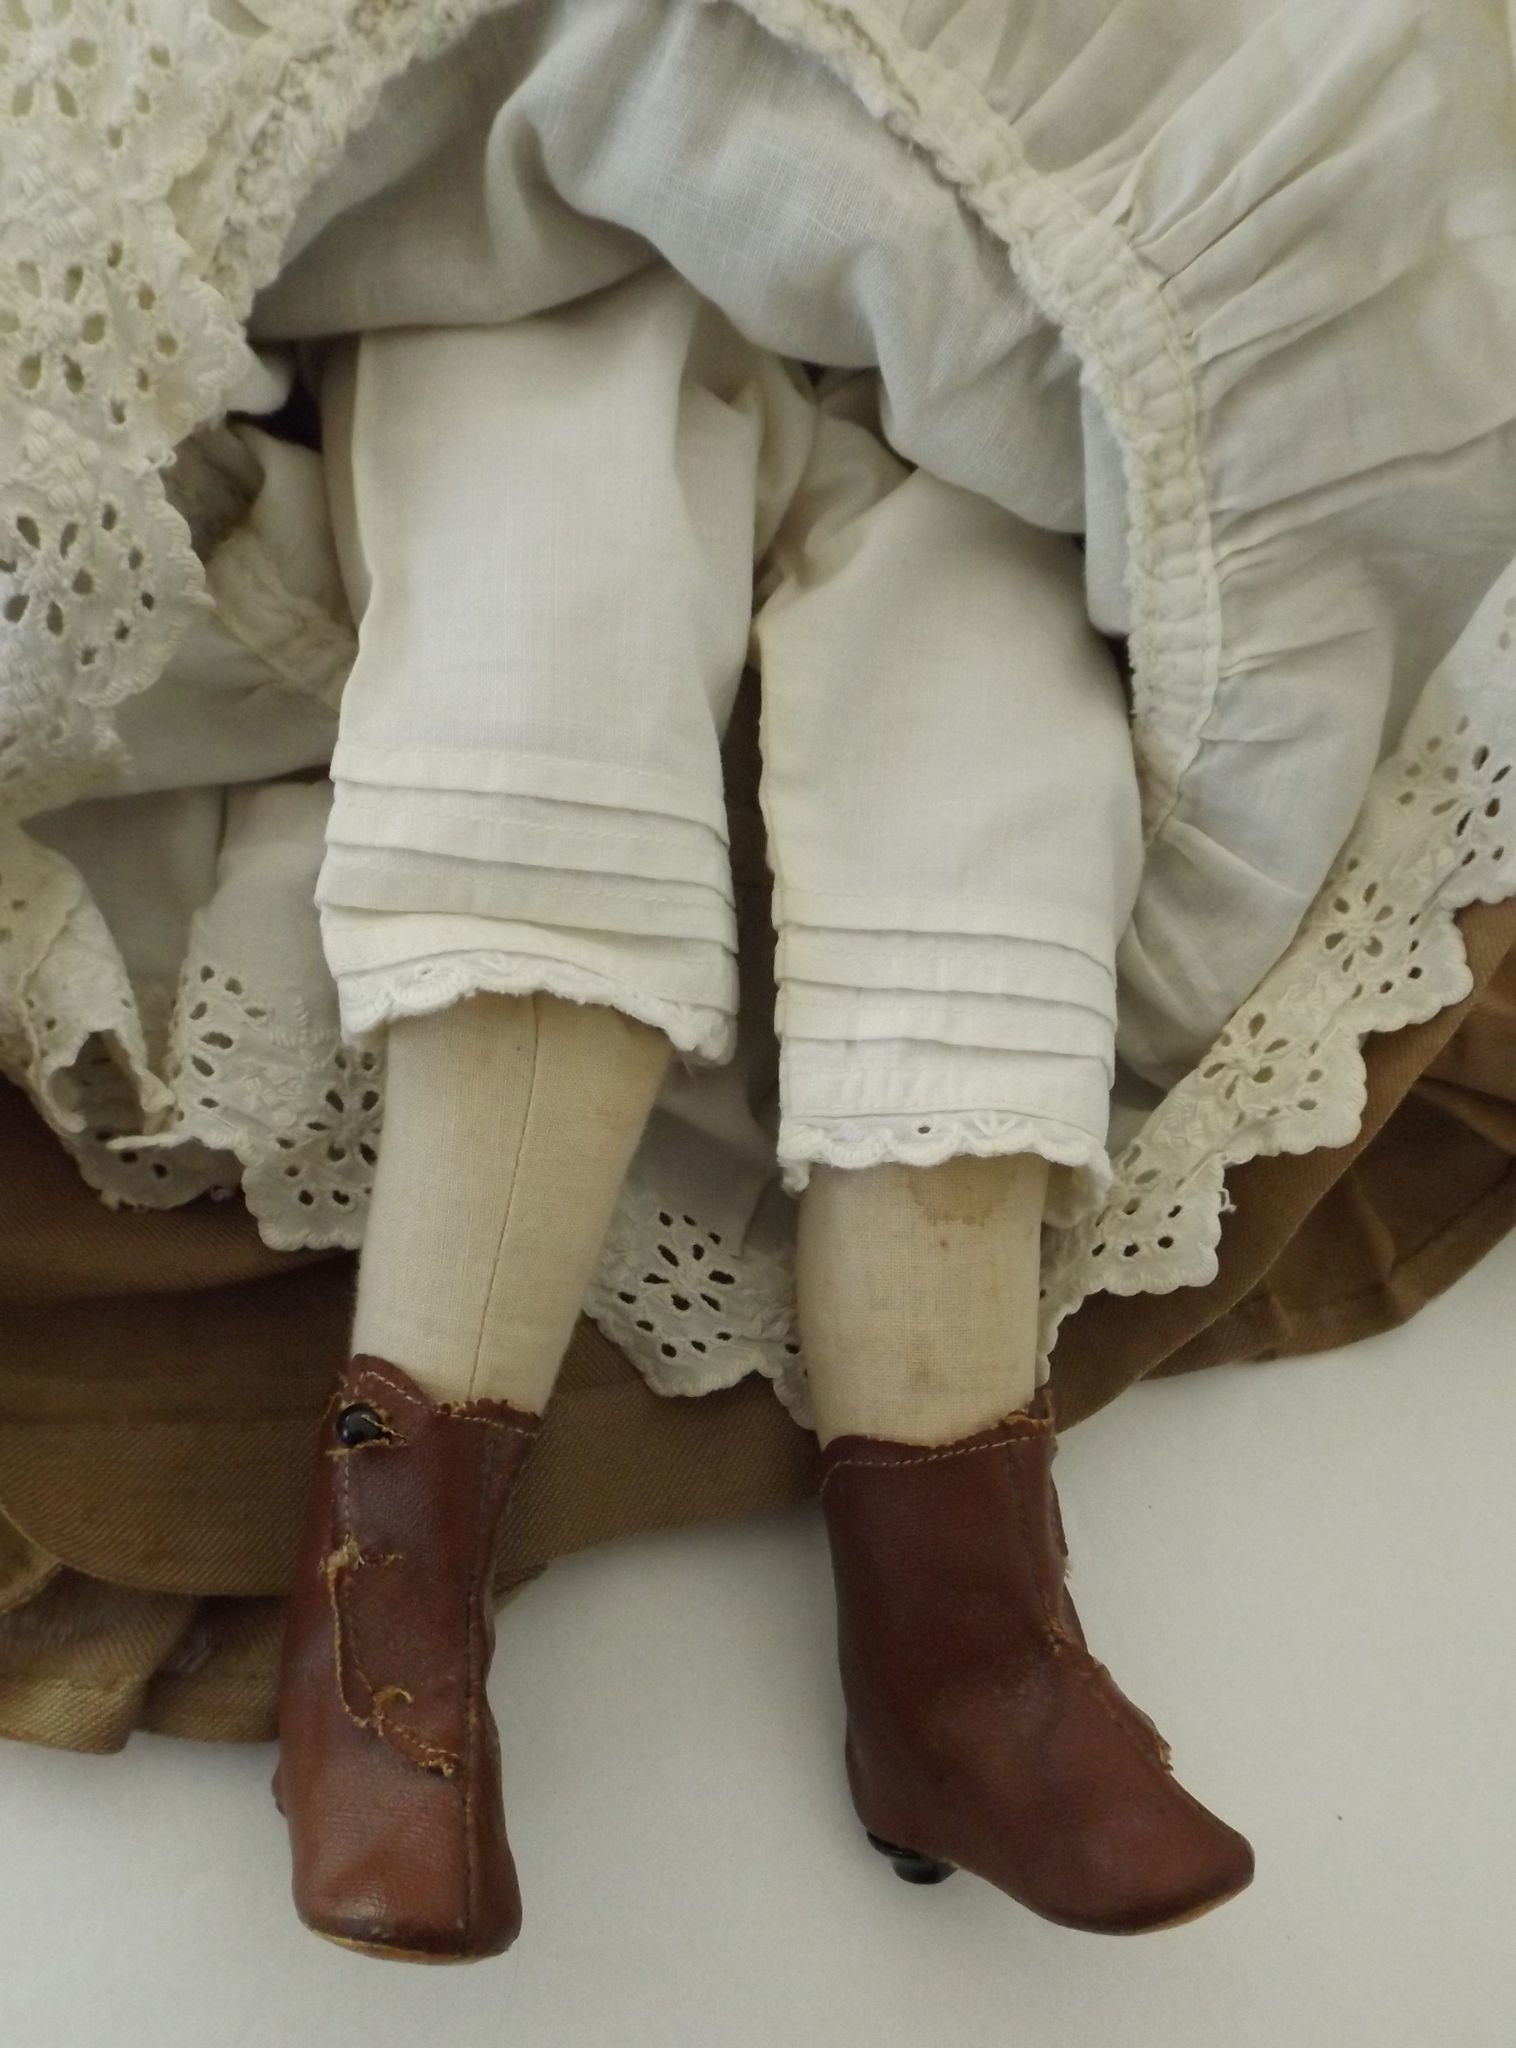 17 papier mache fashion doll antique clothes sold on ruby lane. Black Bedroom Furniture Sets. Home Design Ideas